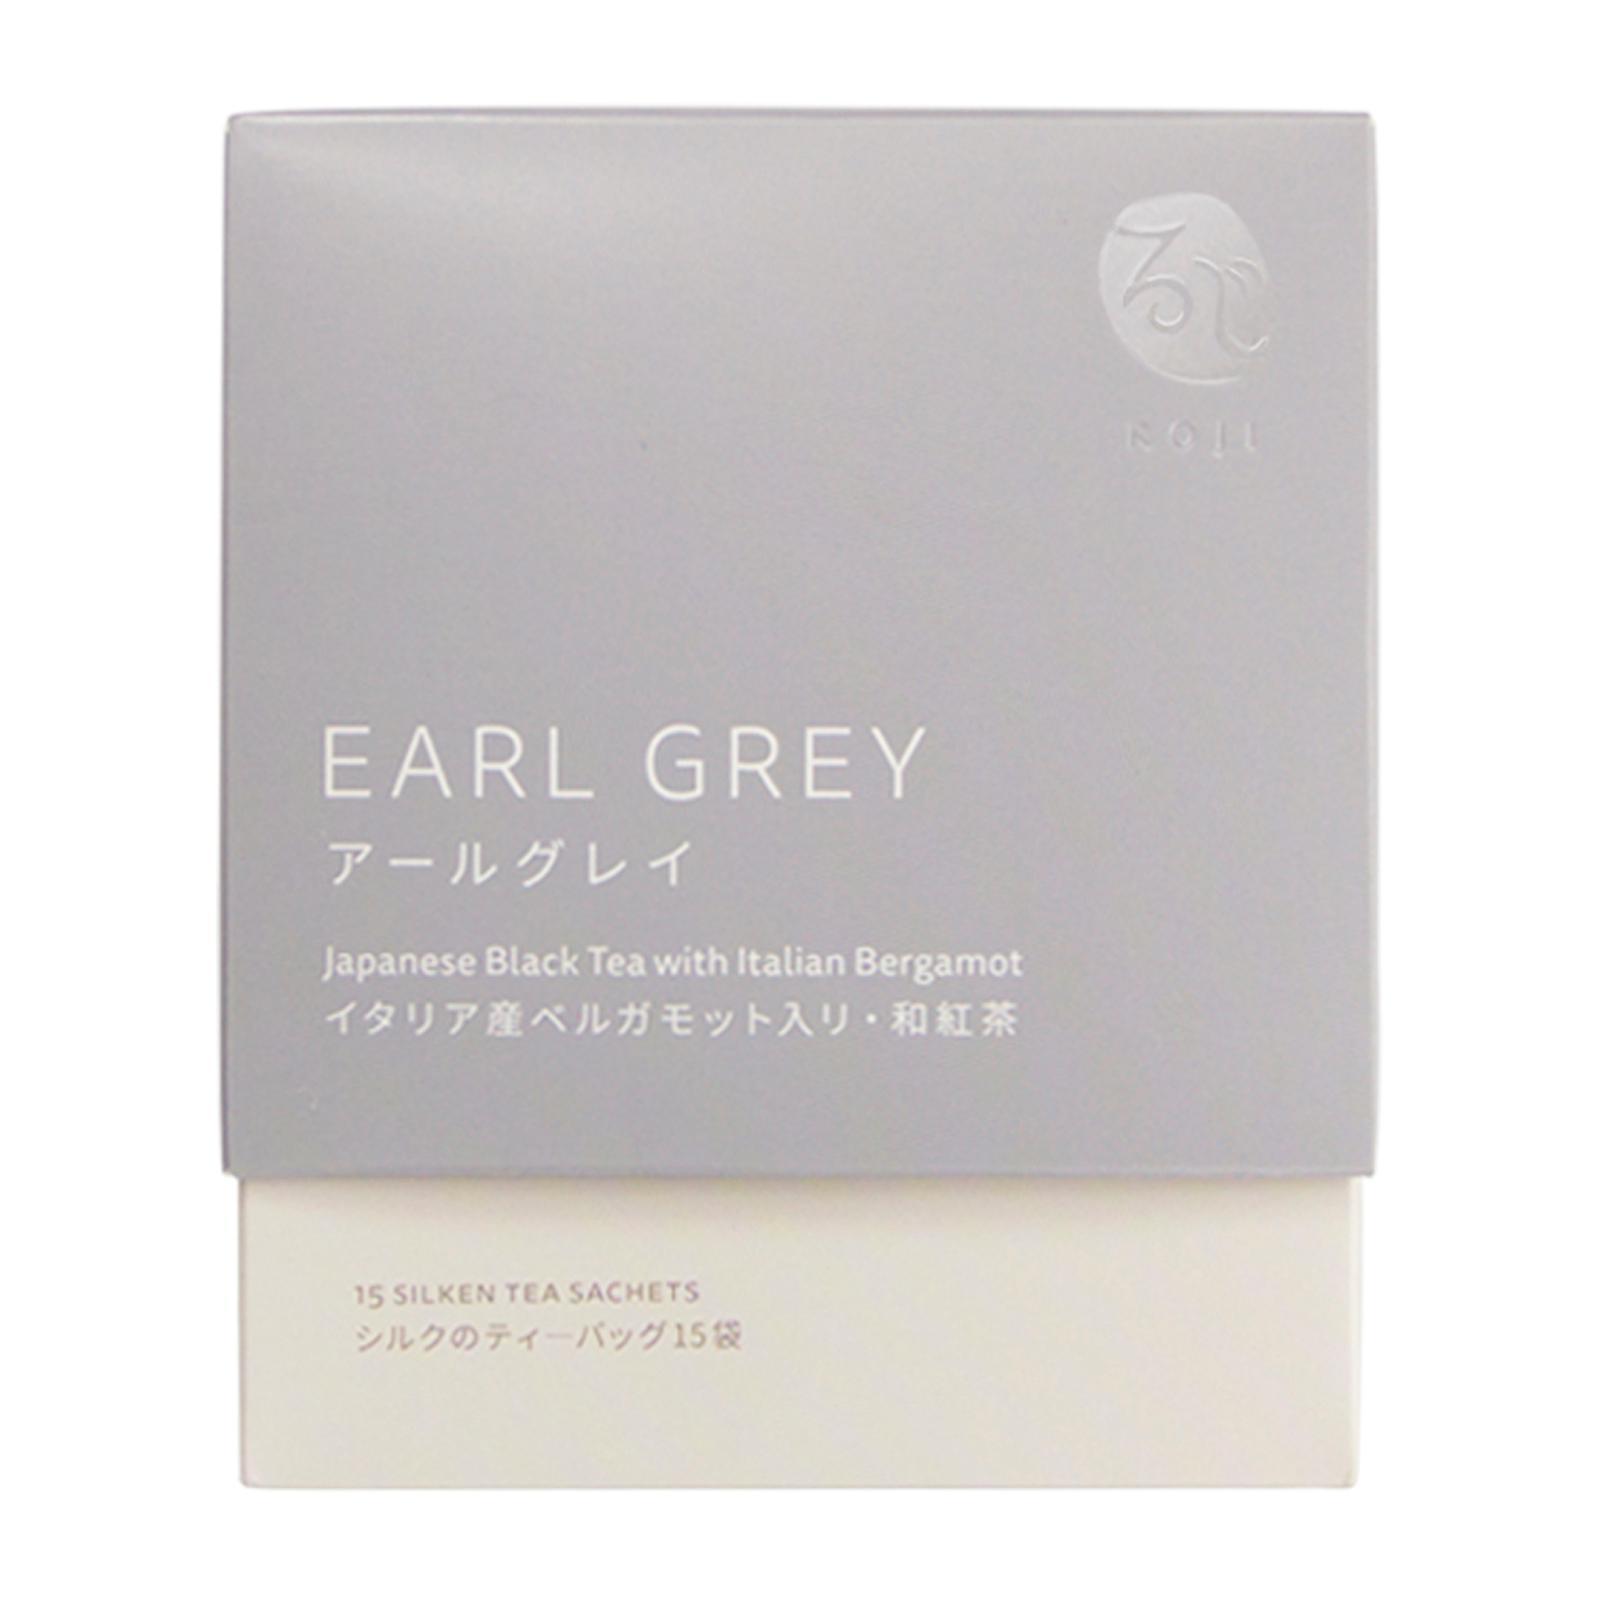 Roji Earl Grey Black Tea